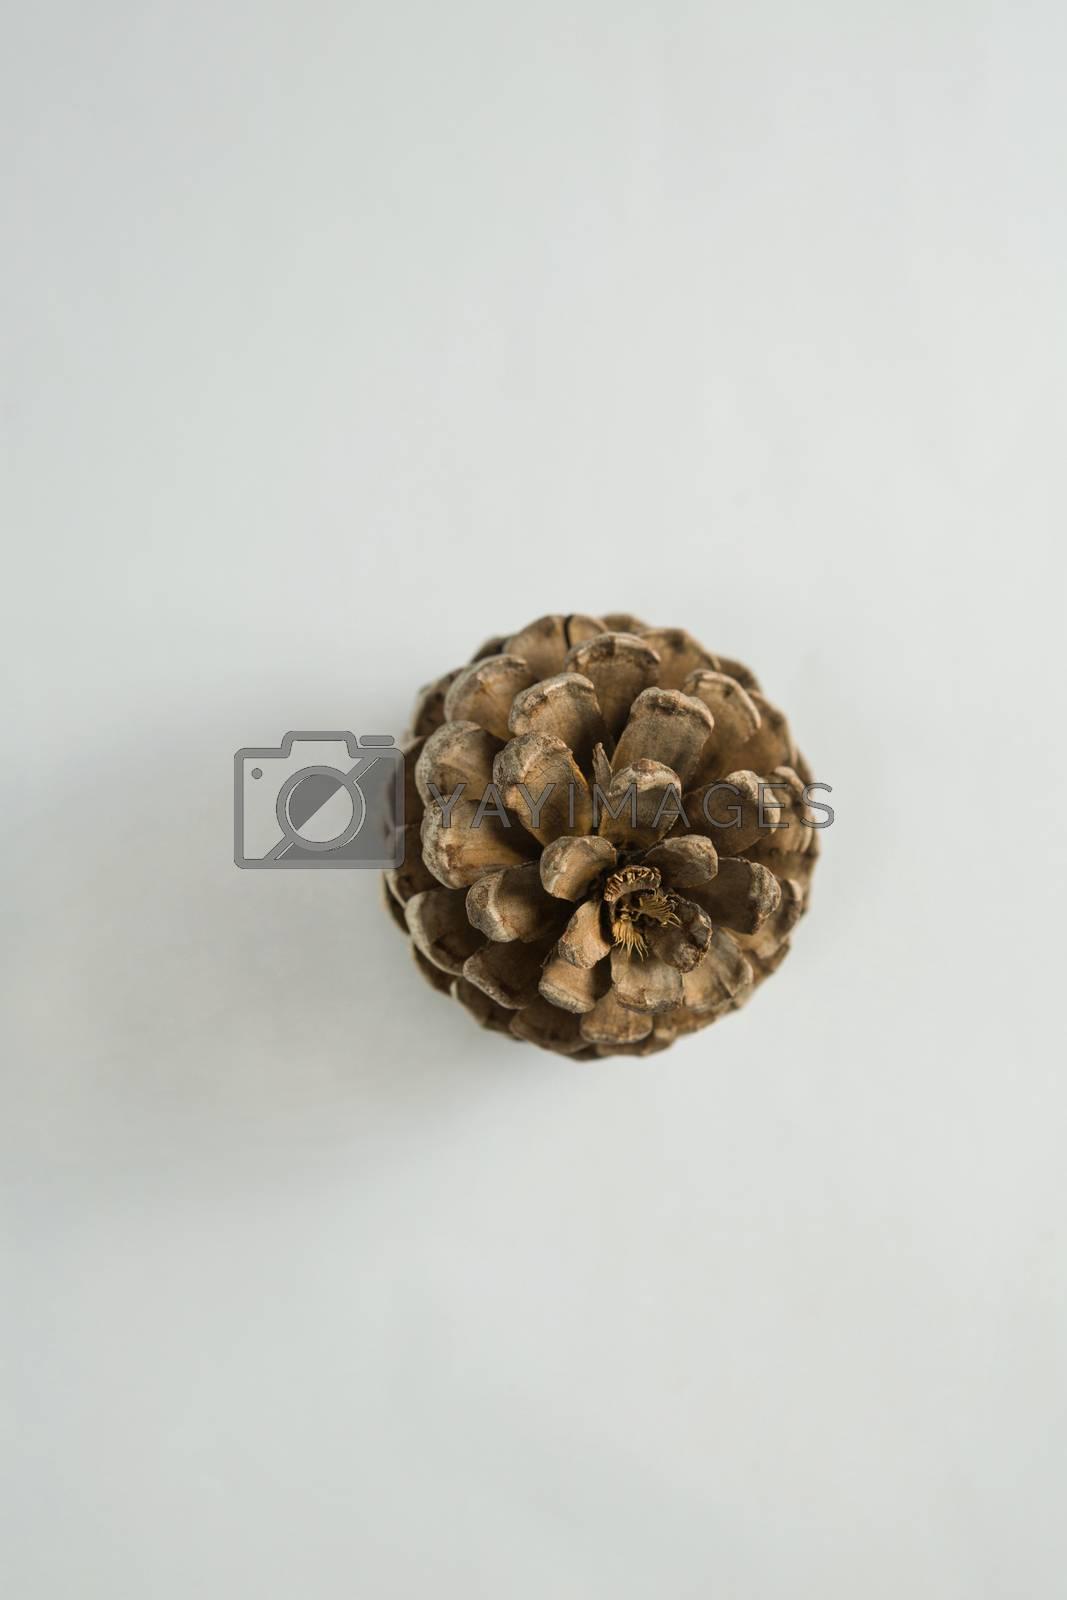 Pine cone on white background by Wavebreakmedia